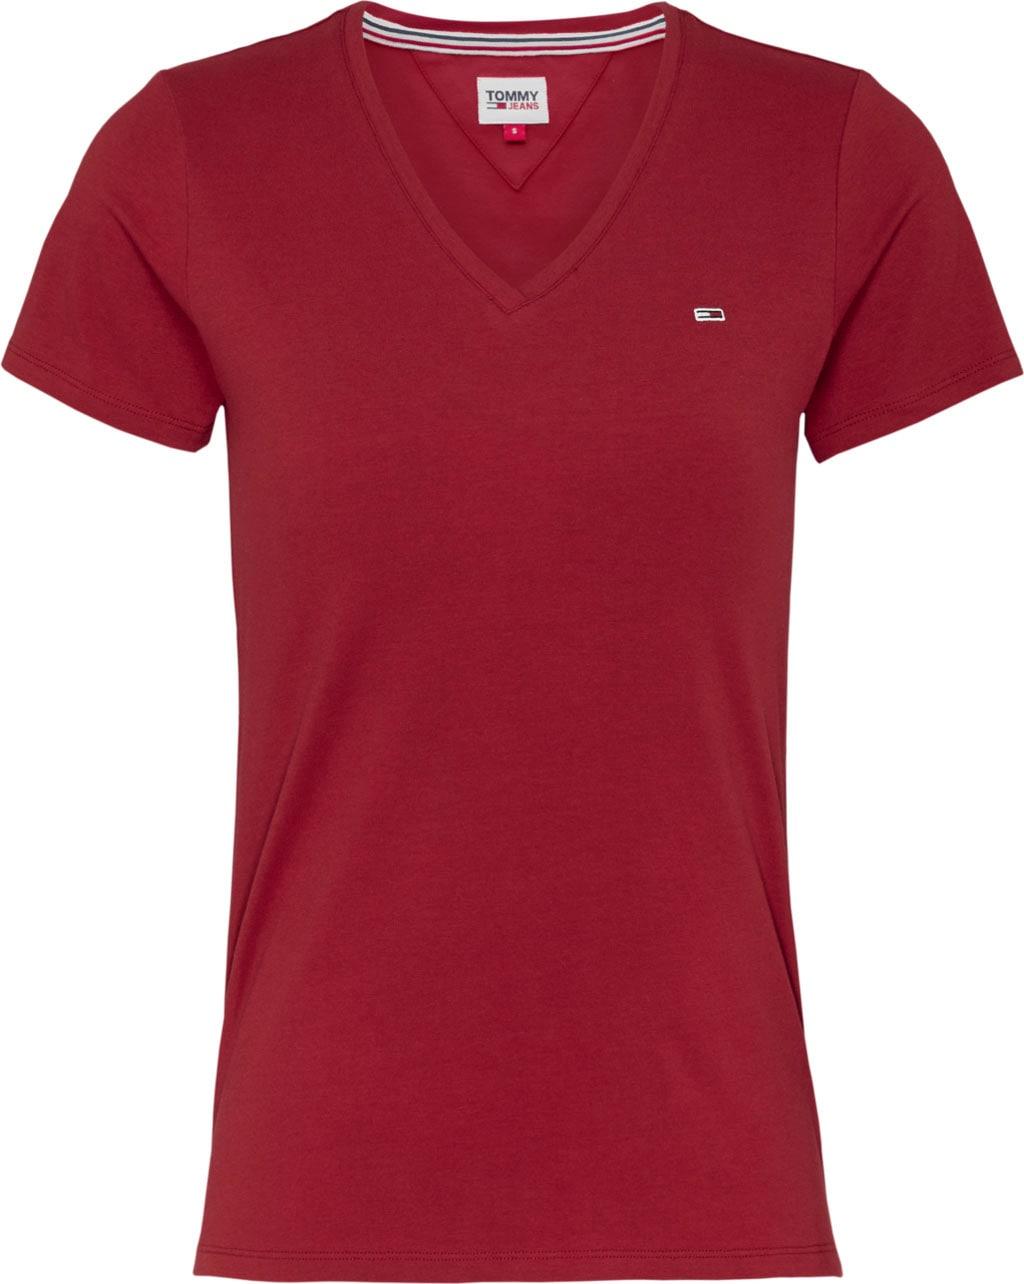 tommy jeans -  V-Shirt TJW SLIM JERSEY VN SHORTSLEEVE